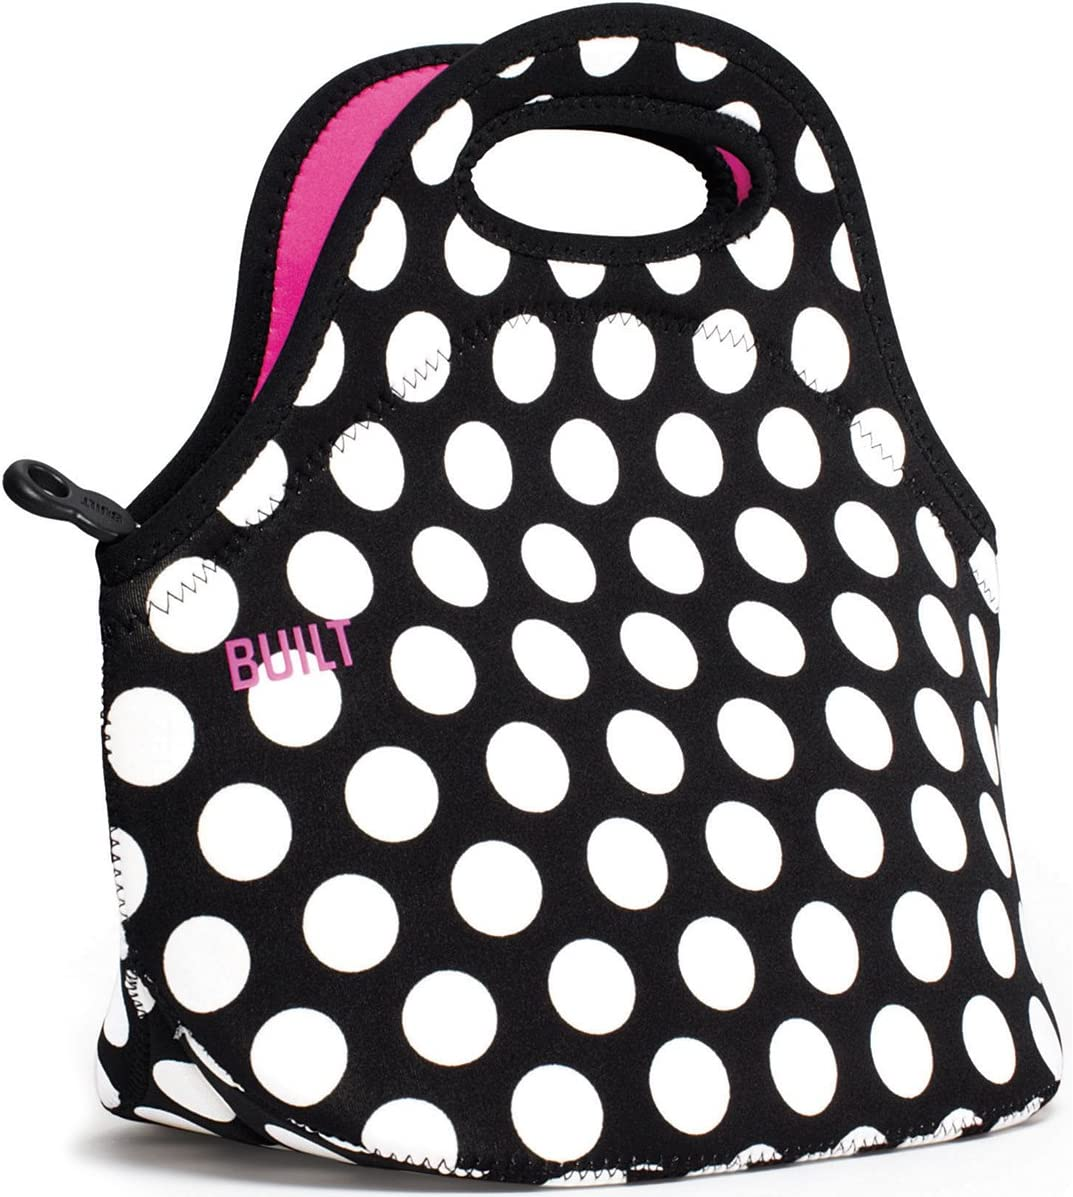 BUILT LB31-BBW Gourmet Getaway Soft Neoprene Lunch Tote Bag-Lightweight, Insulated and Reusable, Big Dot Black & White